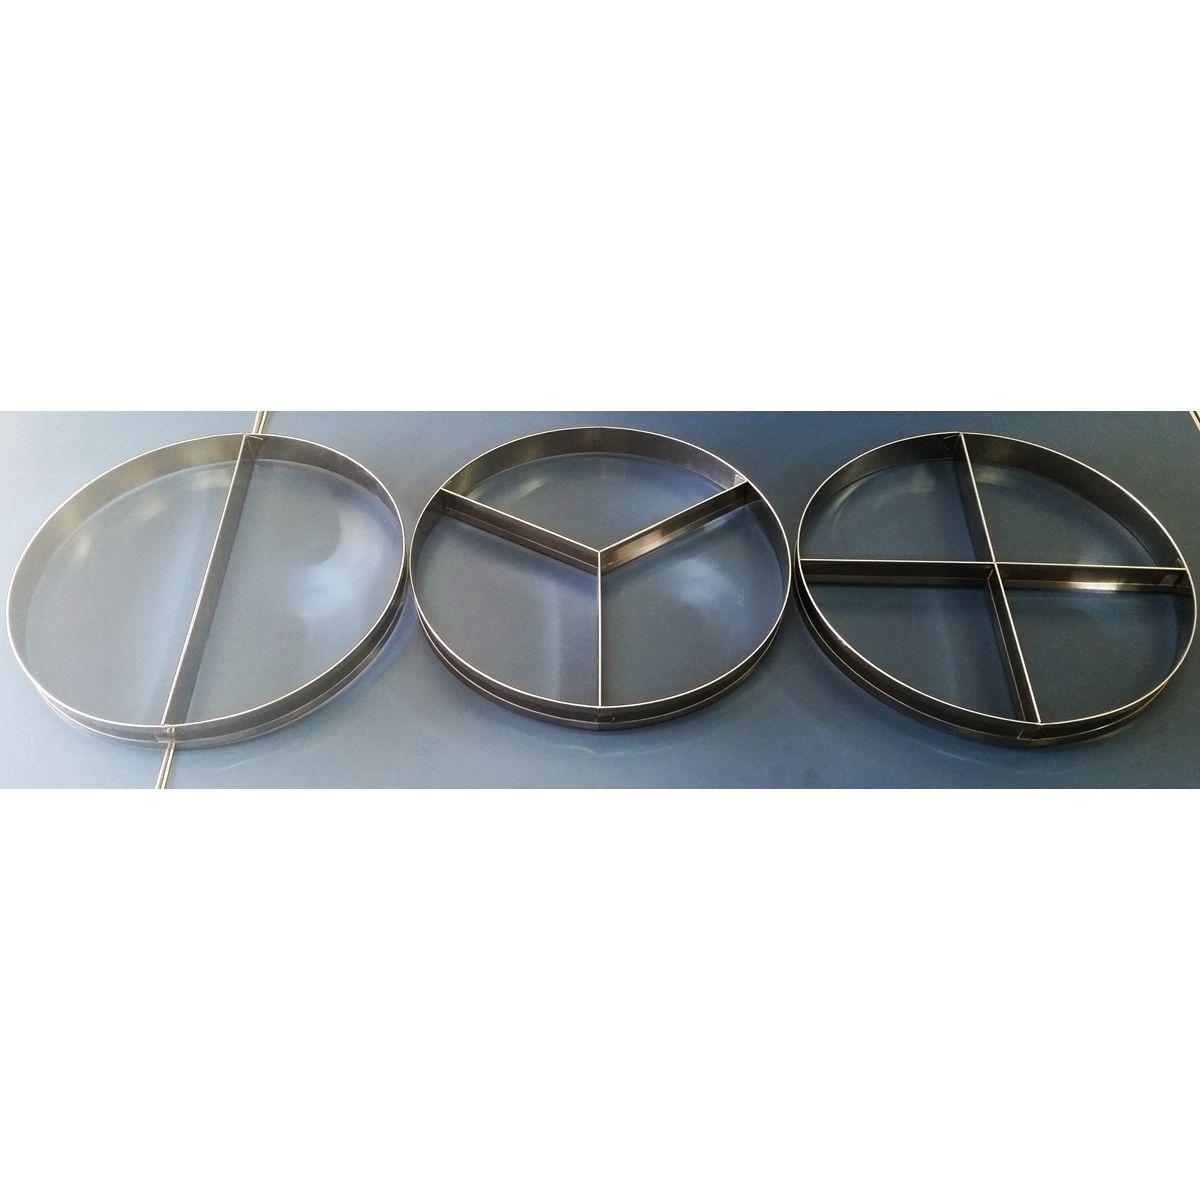 APARTADORES - 2, 3 e 4 SABORES INOX. P/PIZZAS DE 45 CM  - Fórum de Pizzas Vendas online